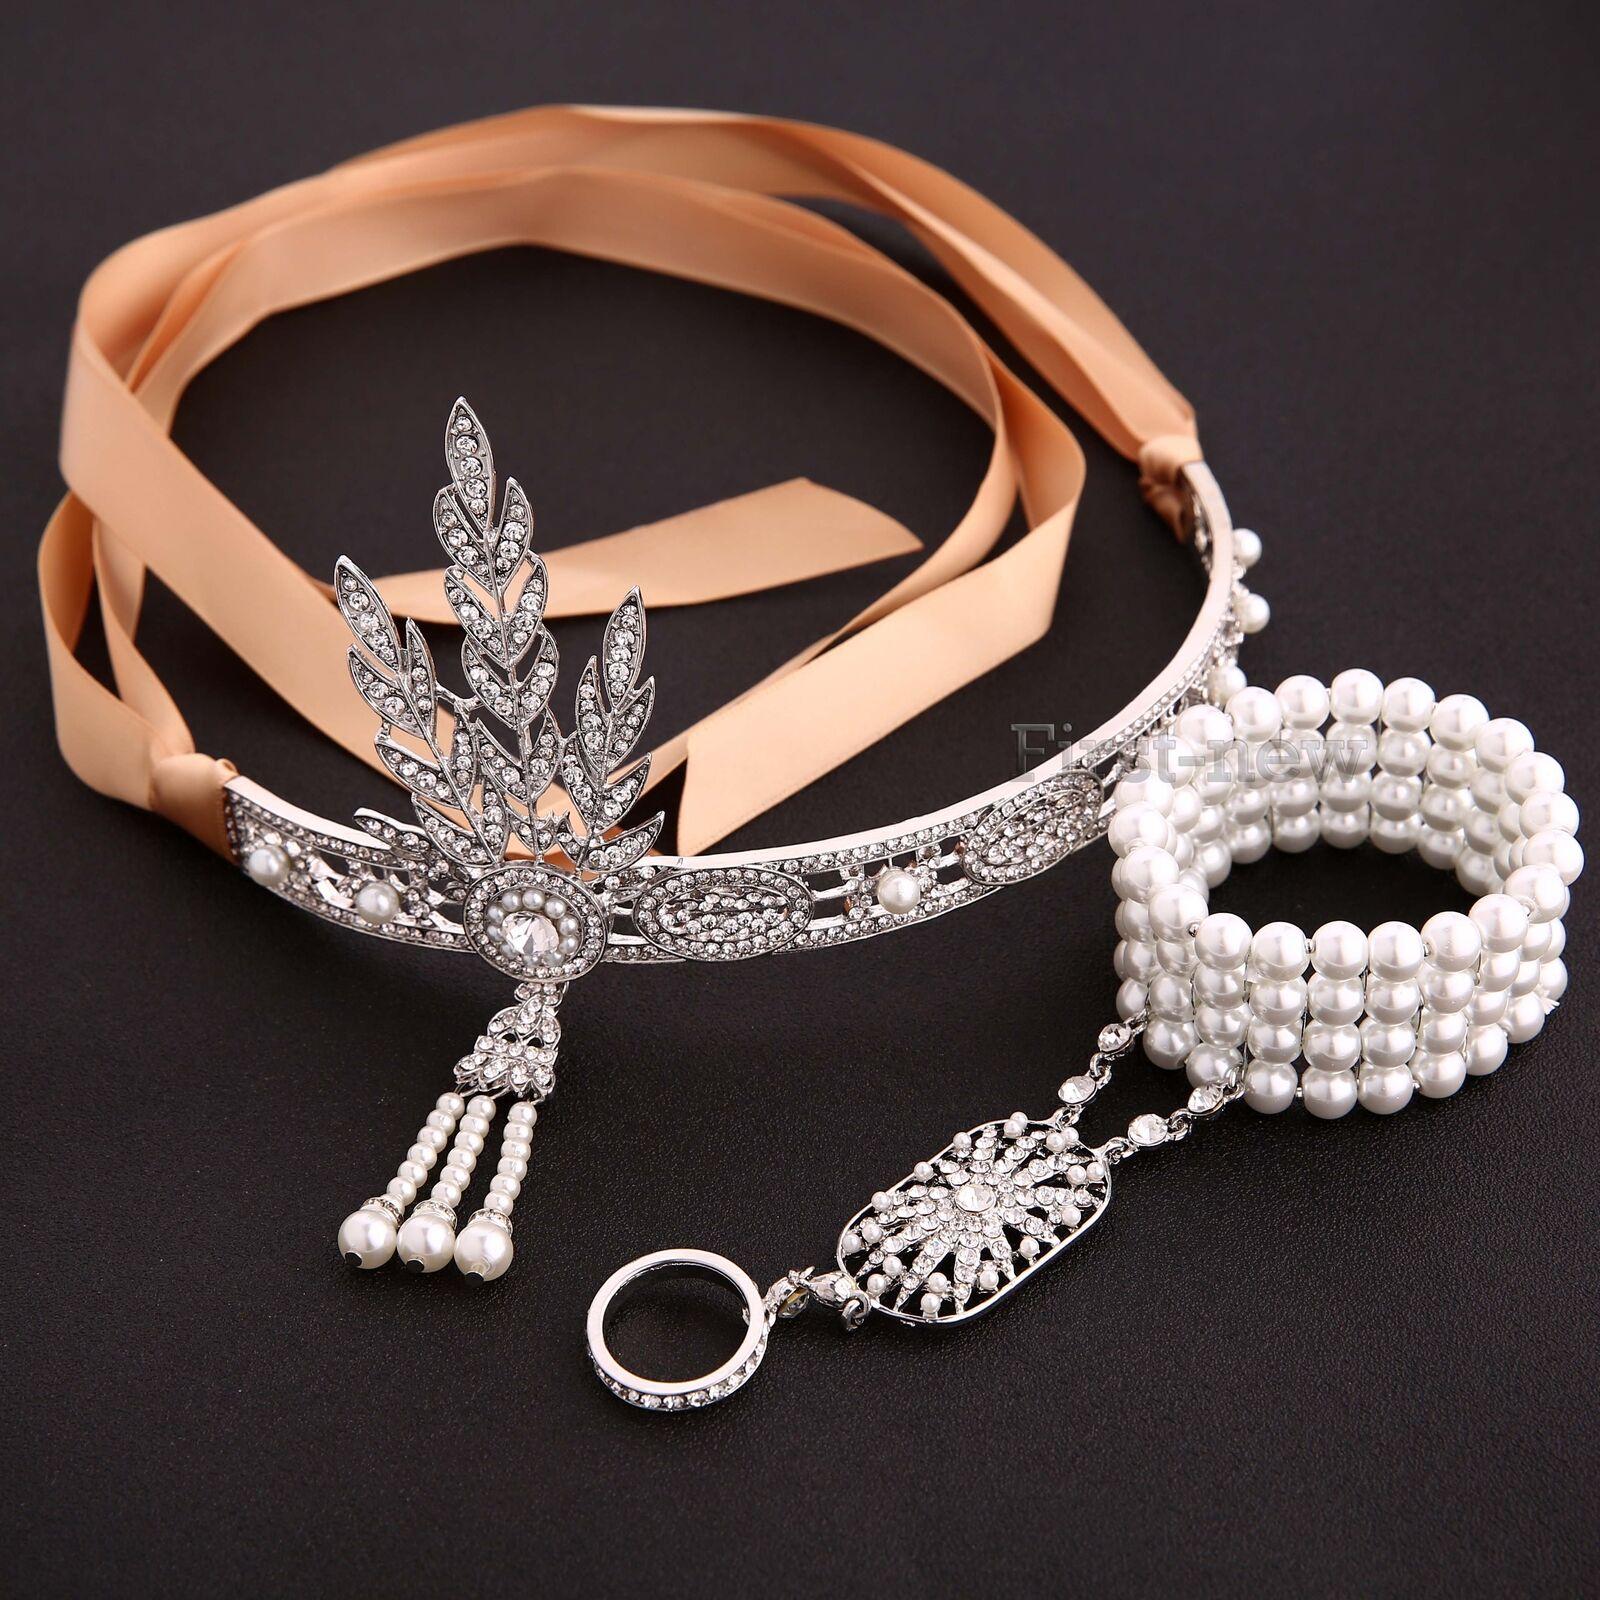 1920s Headband Bracelet Ring Sets Great Gatsby Flapper Vintage